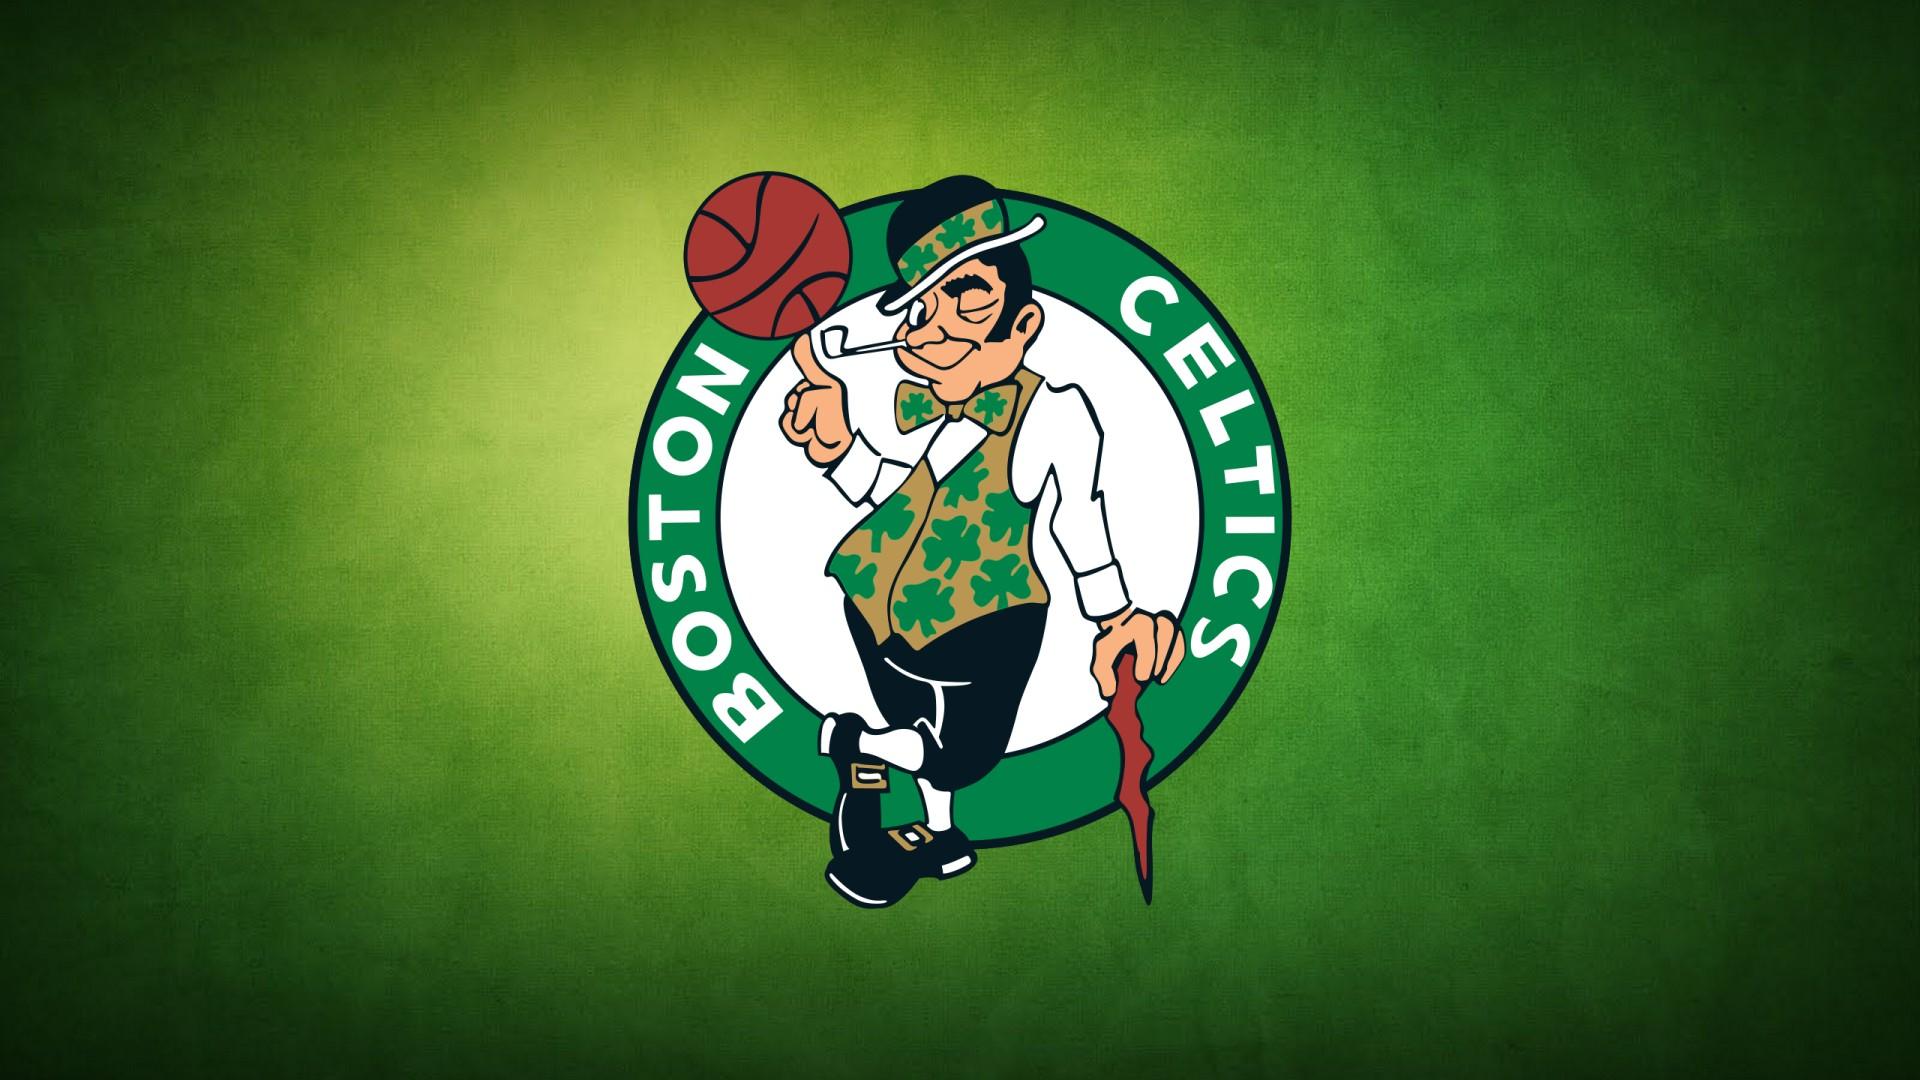 Boston Celtics Desktop Wallpaper 2019 Basketball Wallpaper 1920x1080